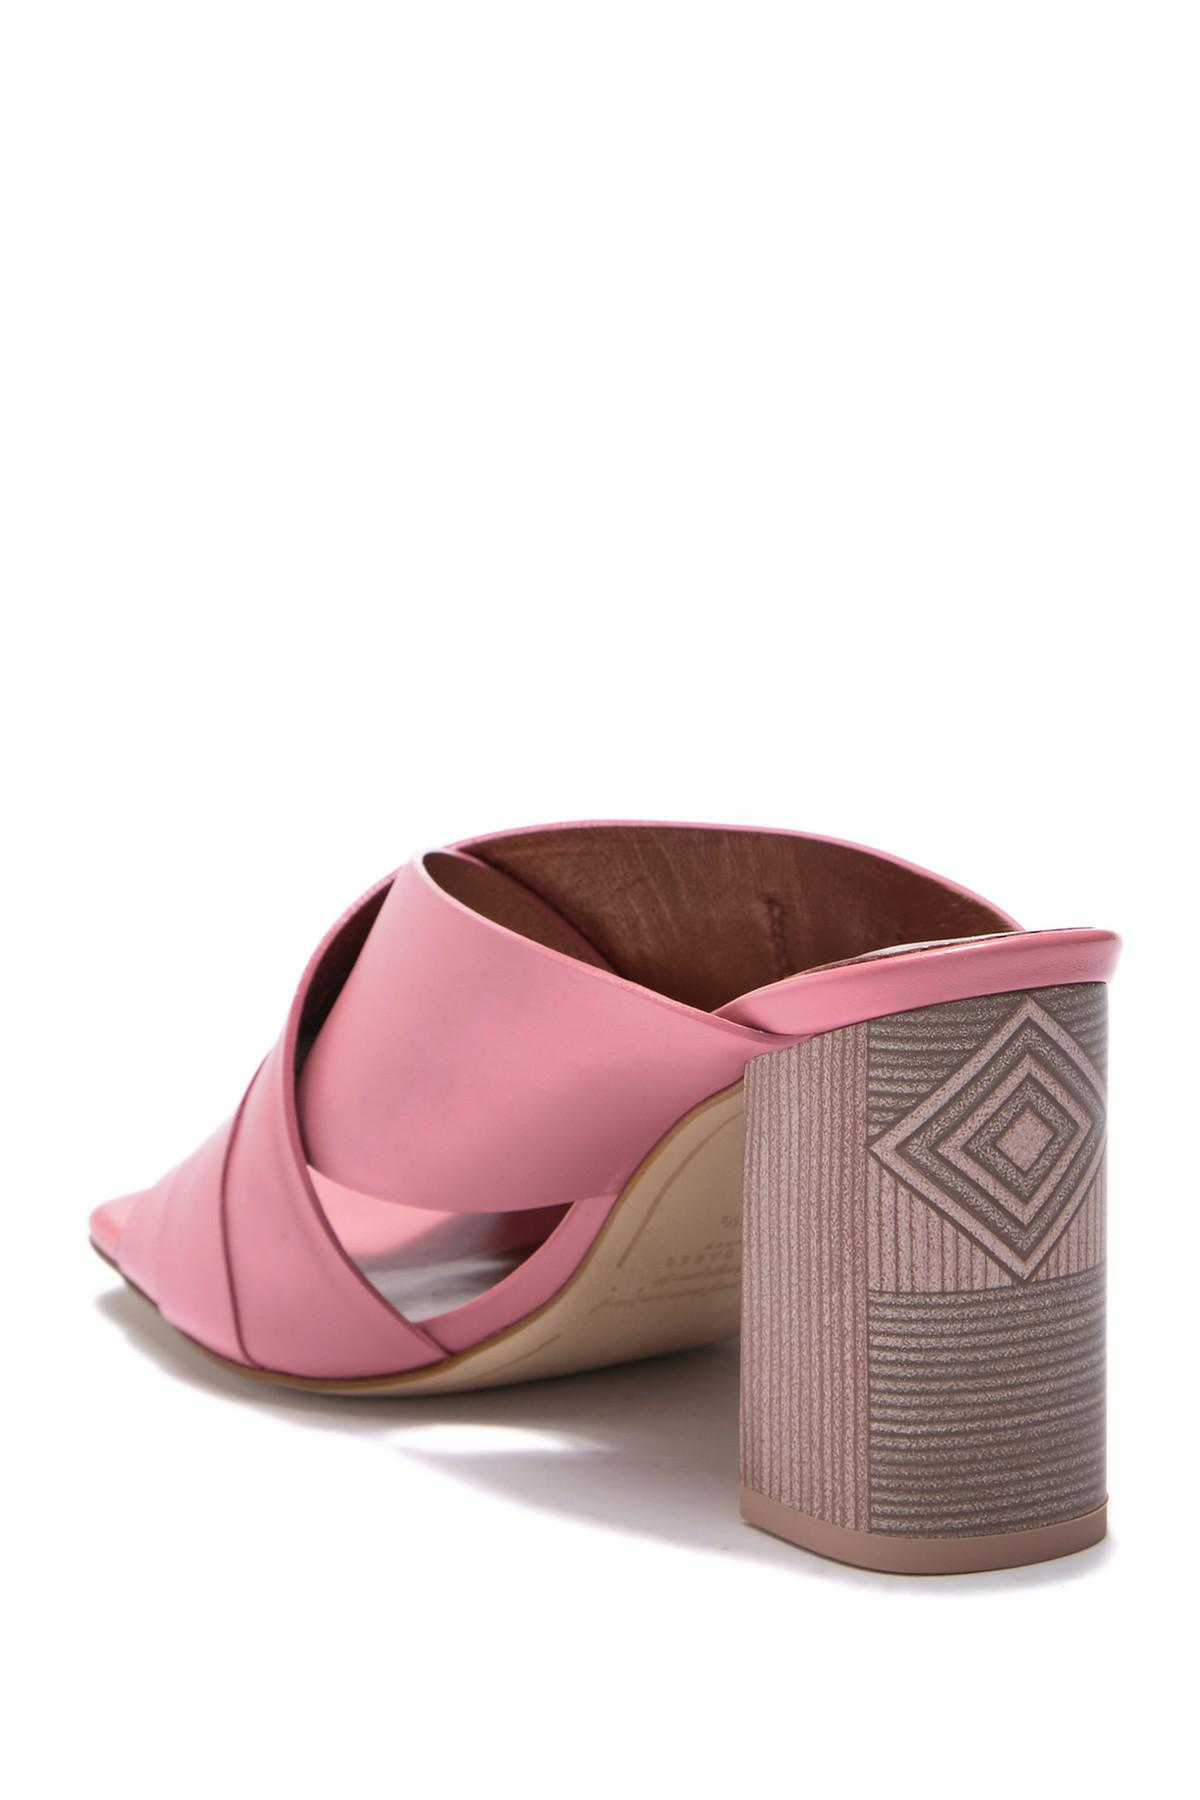 Ted Baker London Maladas Leather Mule Sandal hj2LkHW